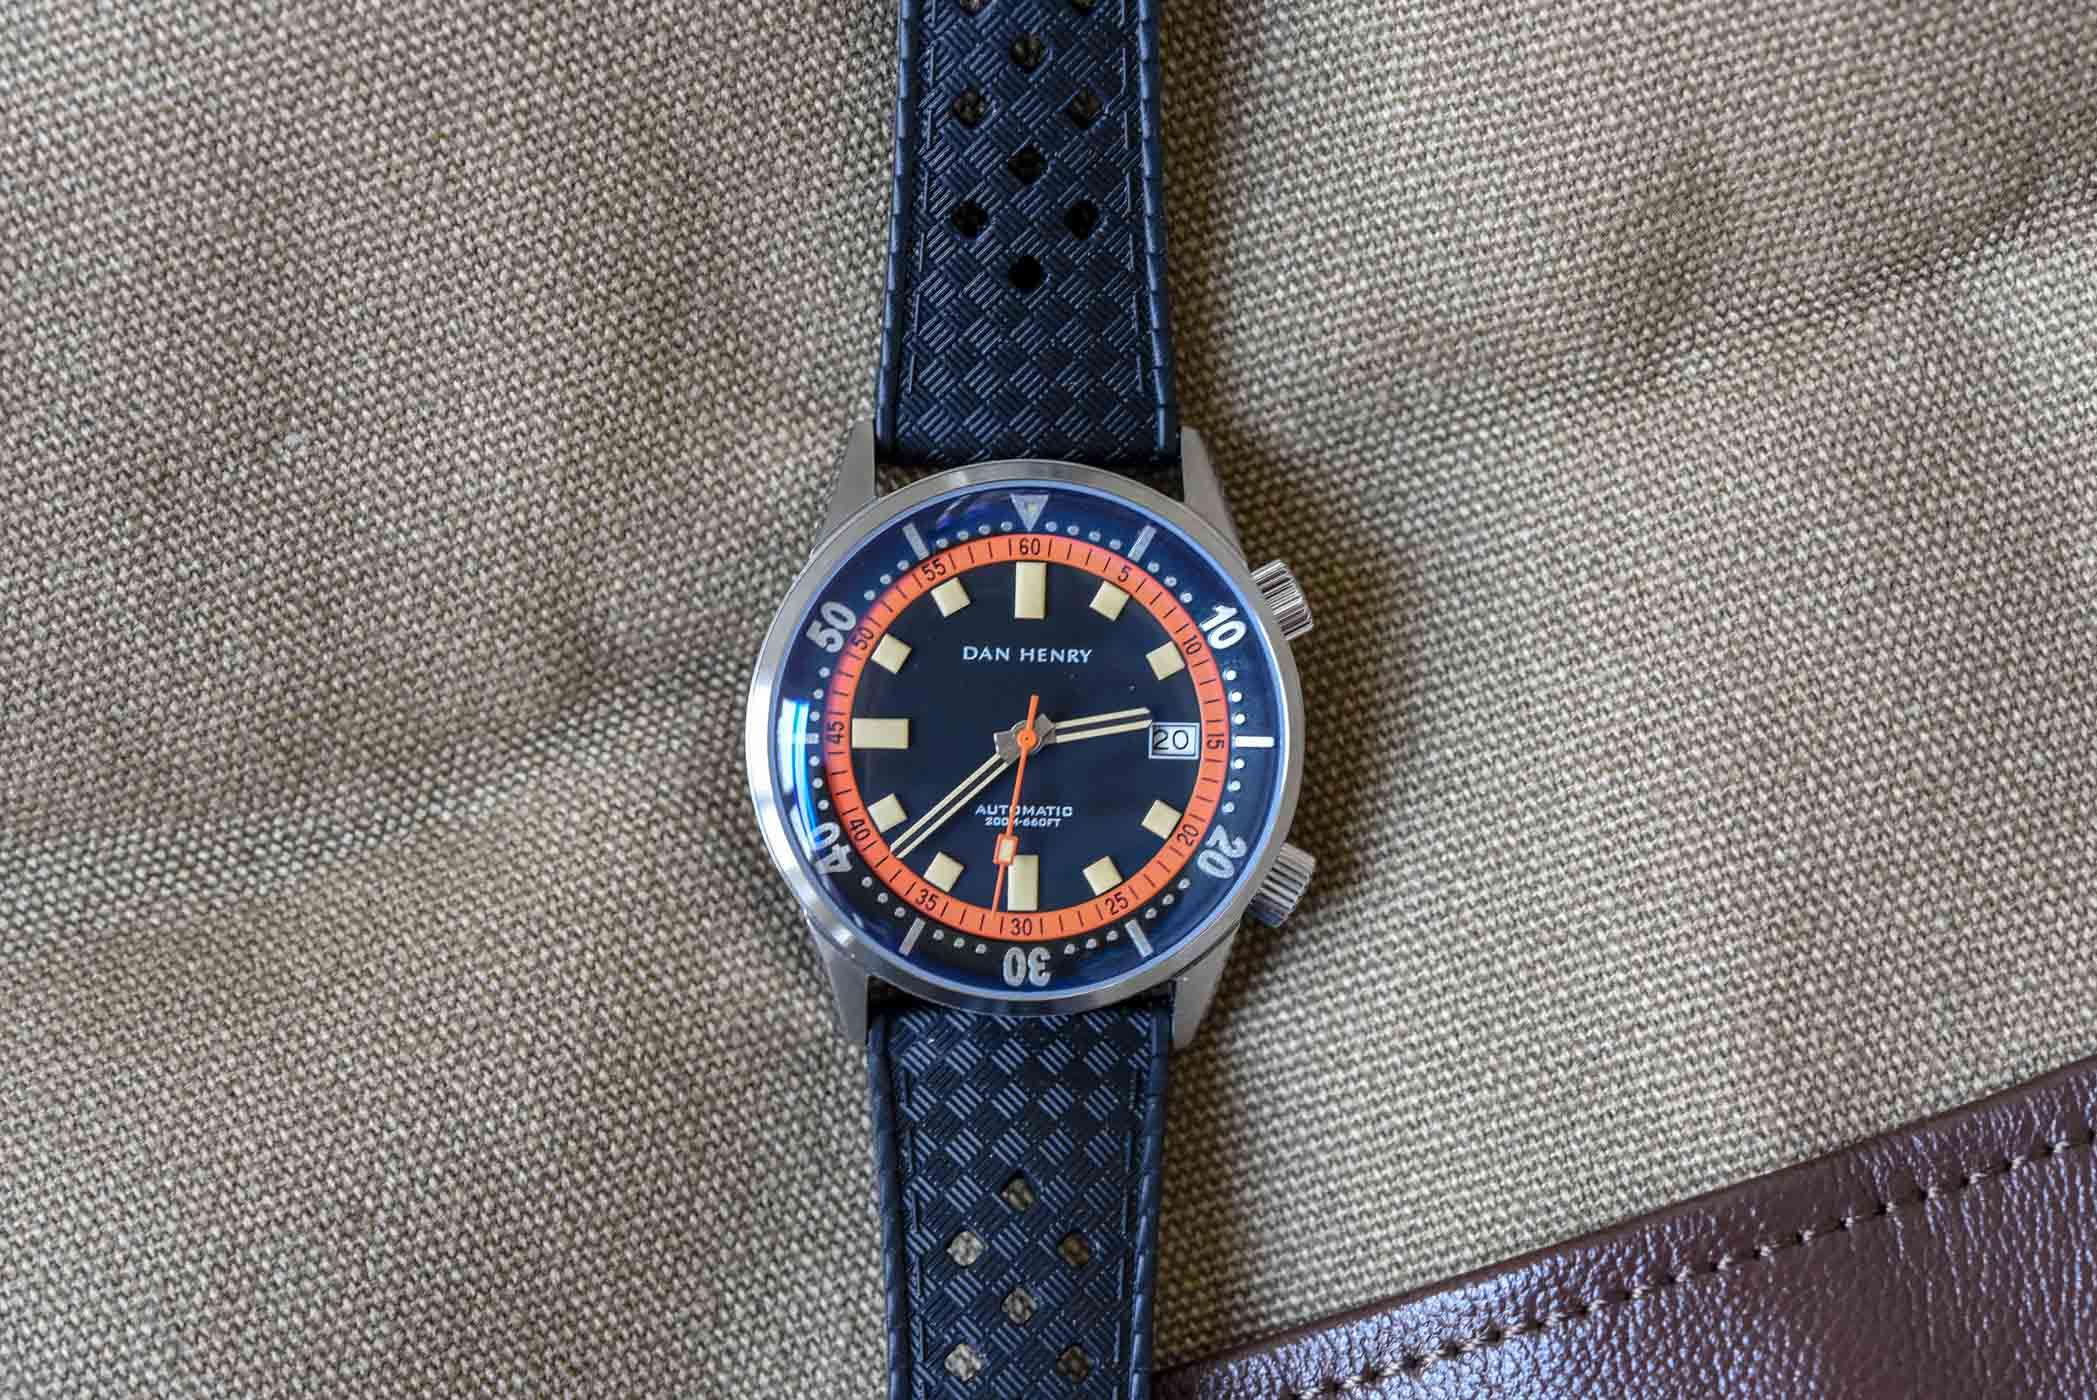 Dan Henry 1970 Automatic Diver-1219